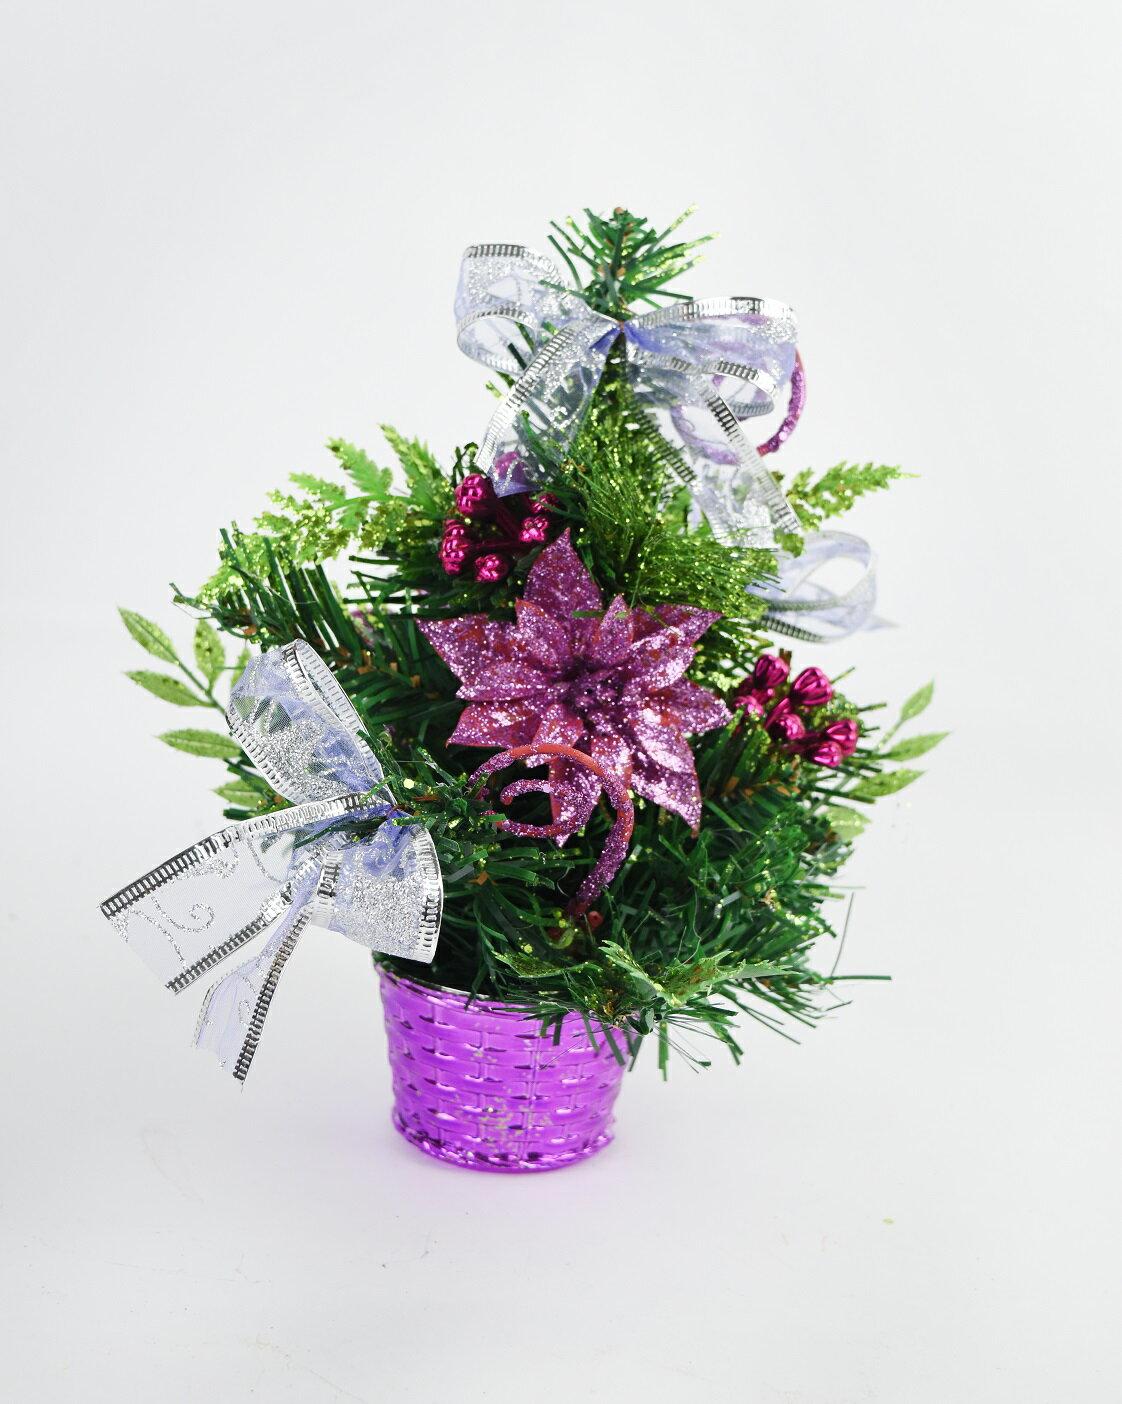 X射線【X454059】20cm裝飾聖誕樹(紫),聖誕樹/聖誕佈置/聖誕燈/會場佈置/材料包/成品樹/小樹